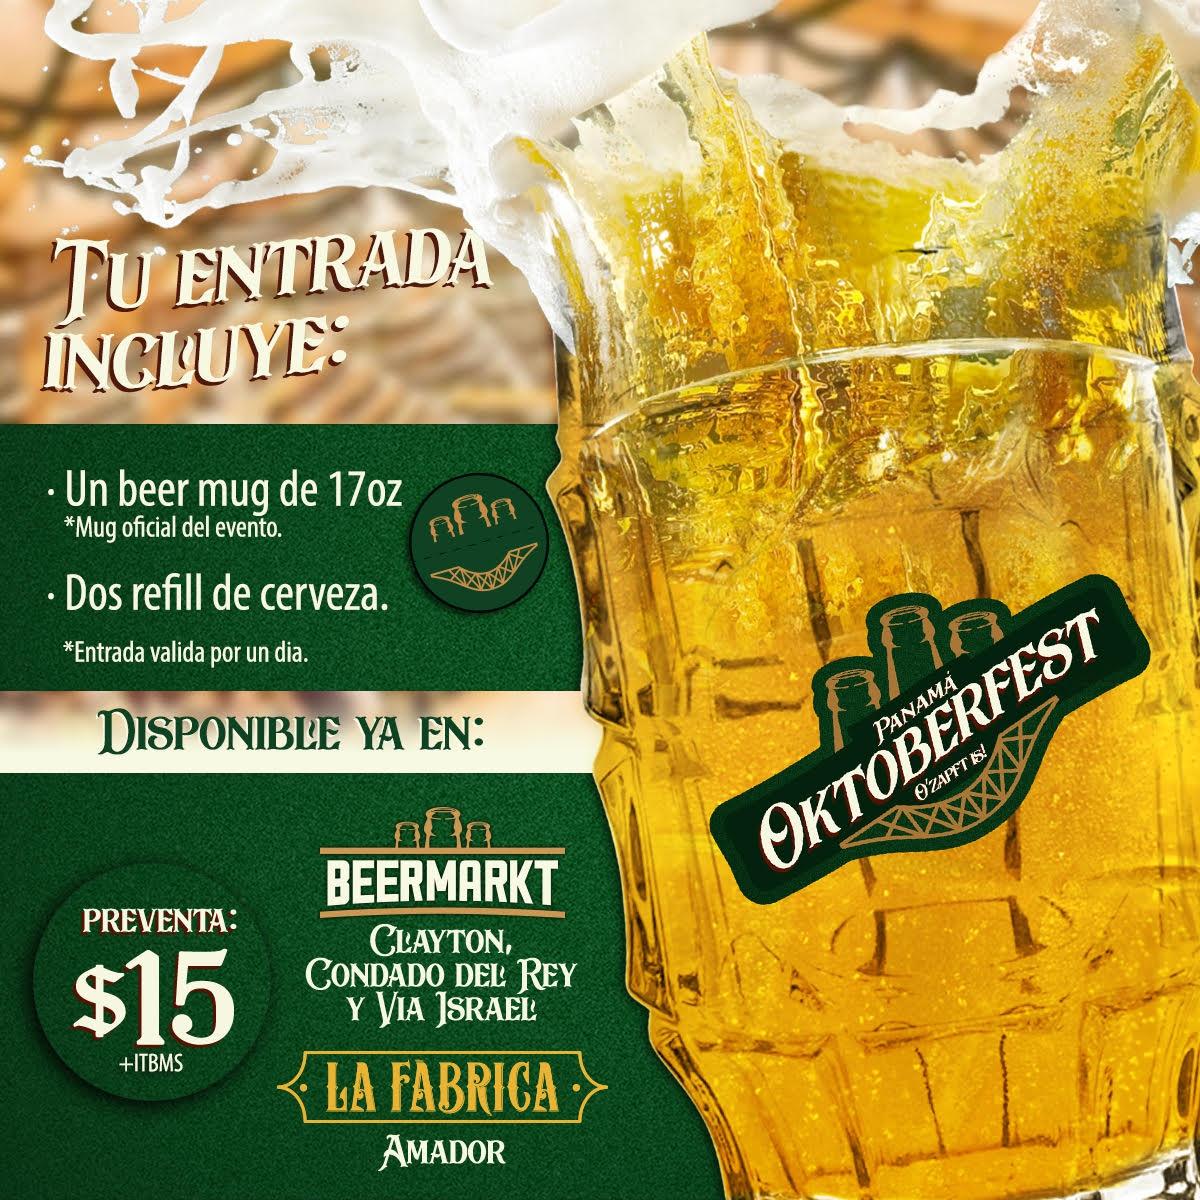 Oktoberfest Panama 2019 - Tickets on sale